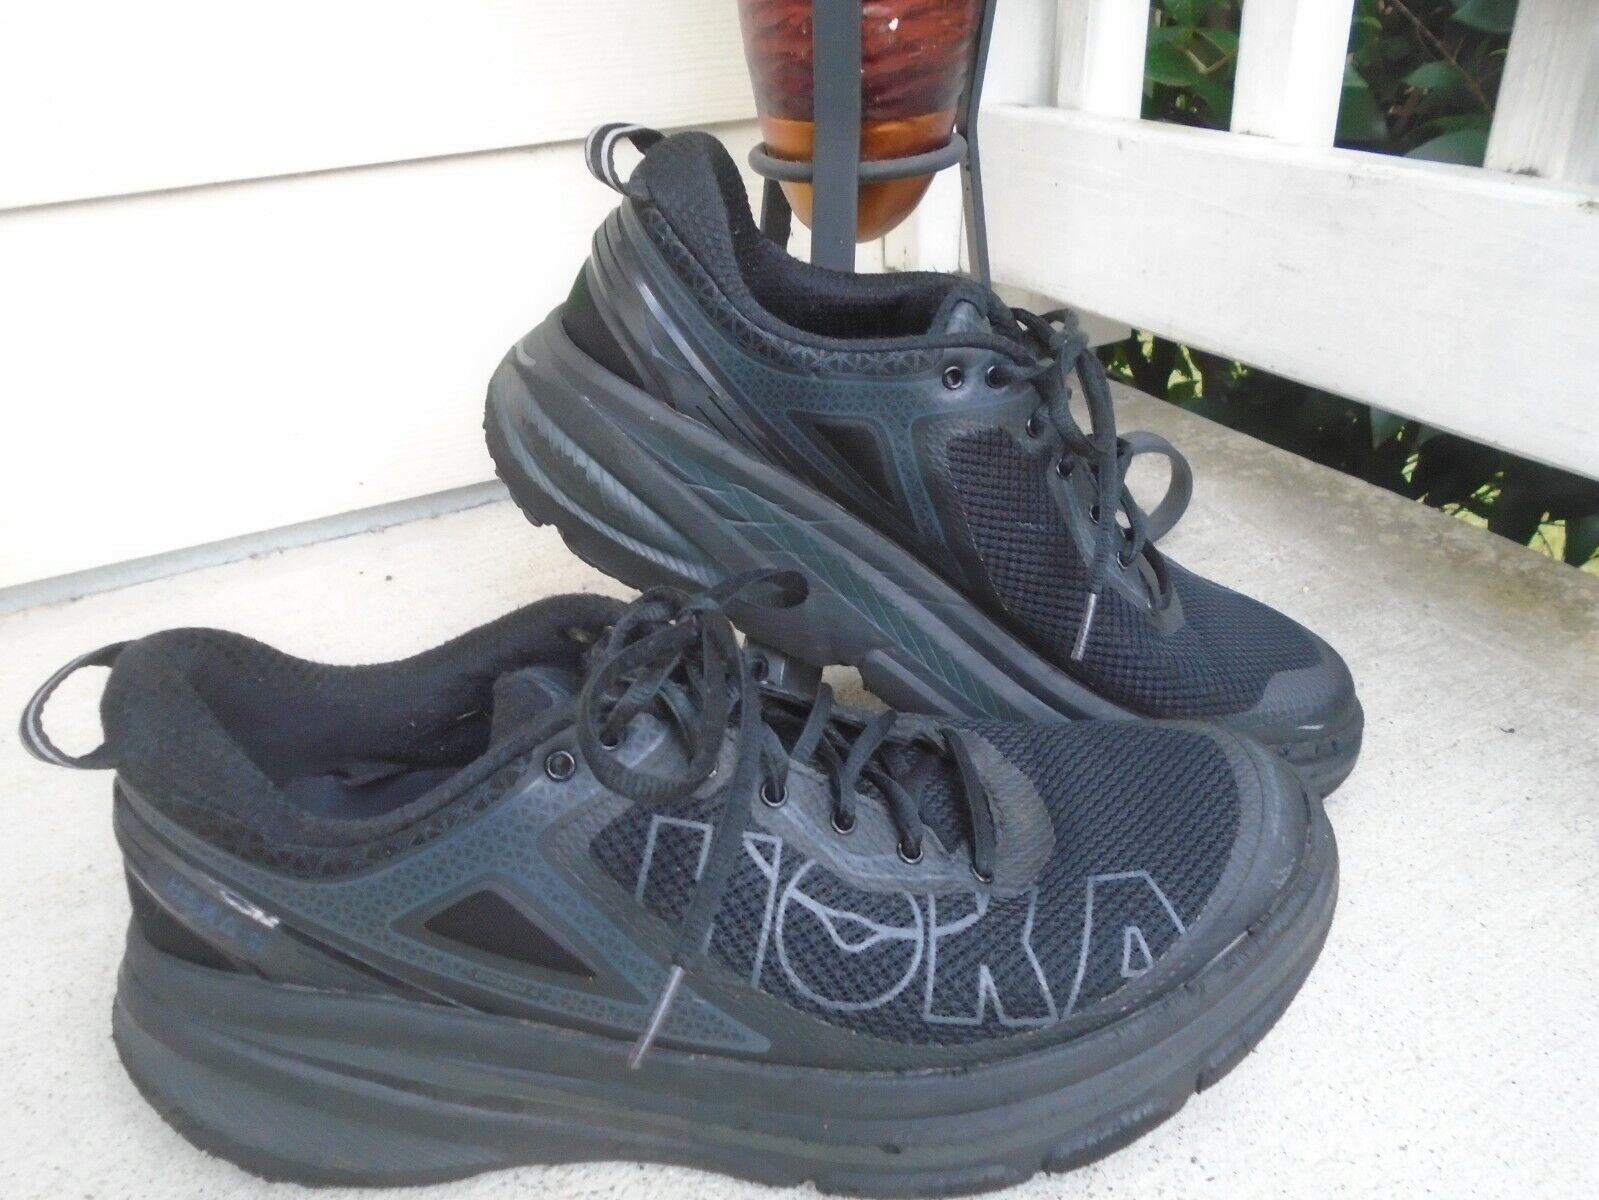 Hoka One One Mens Bondi Ltr Shoes